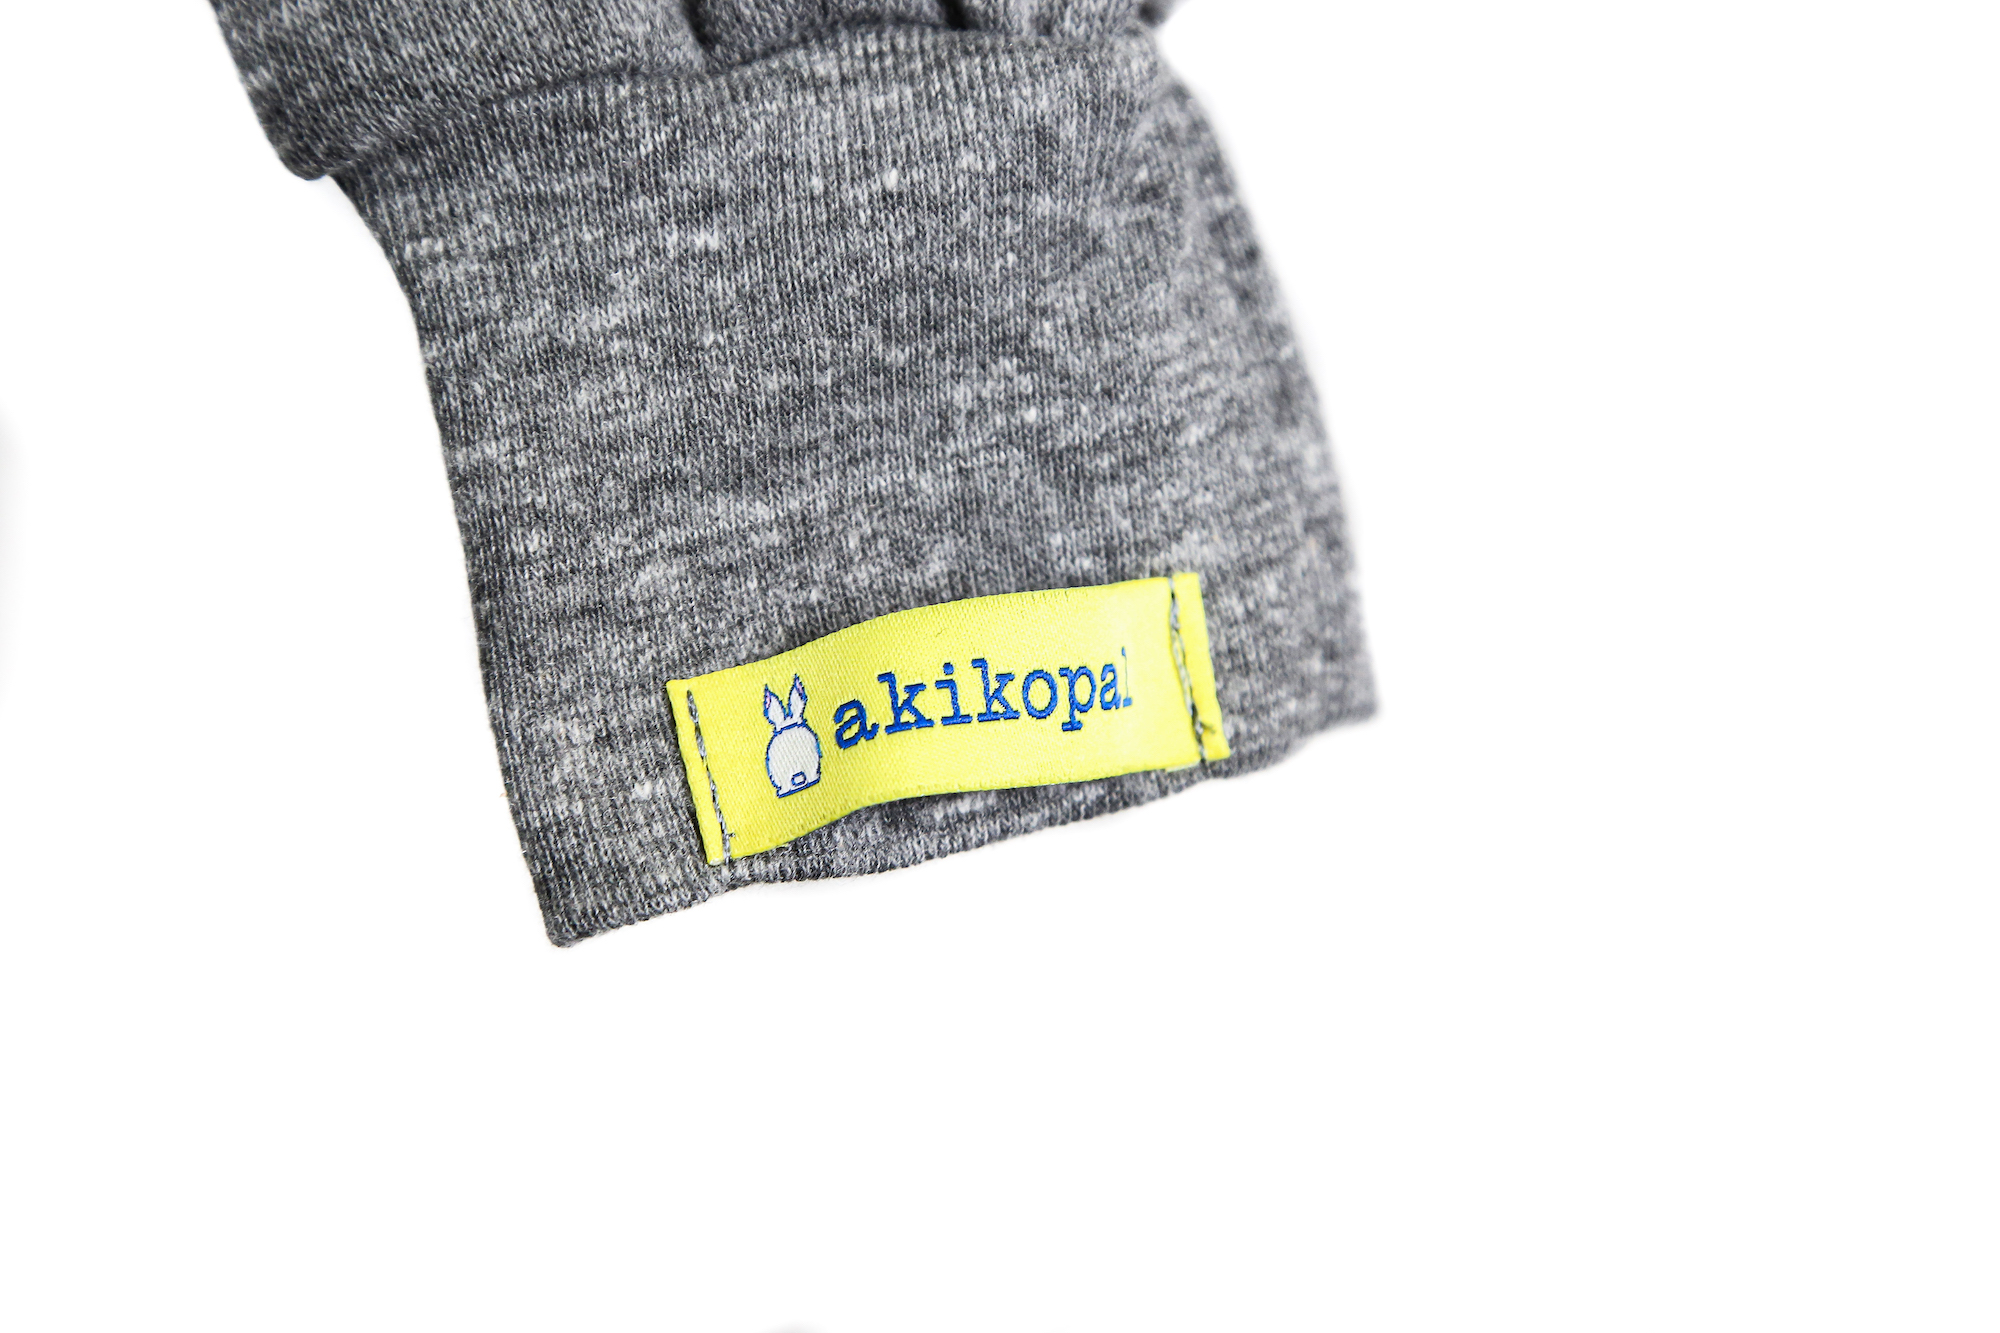 Akikopal sleeve tag embroidered